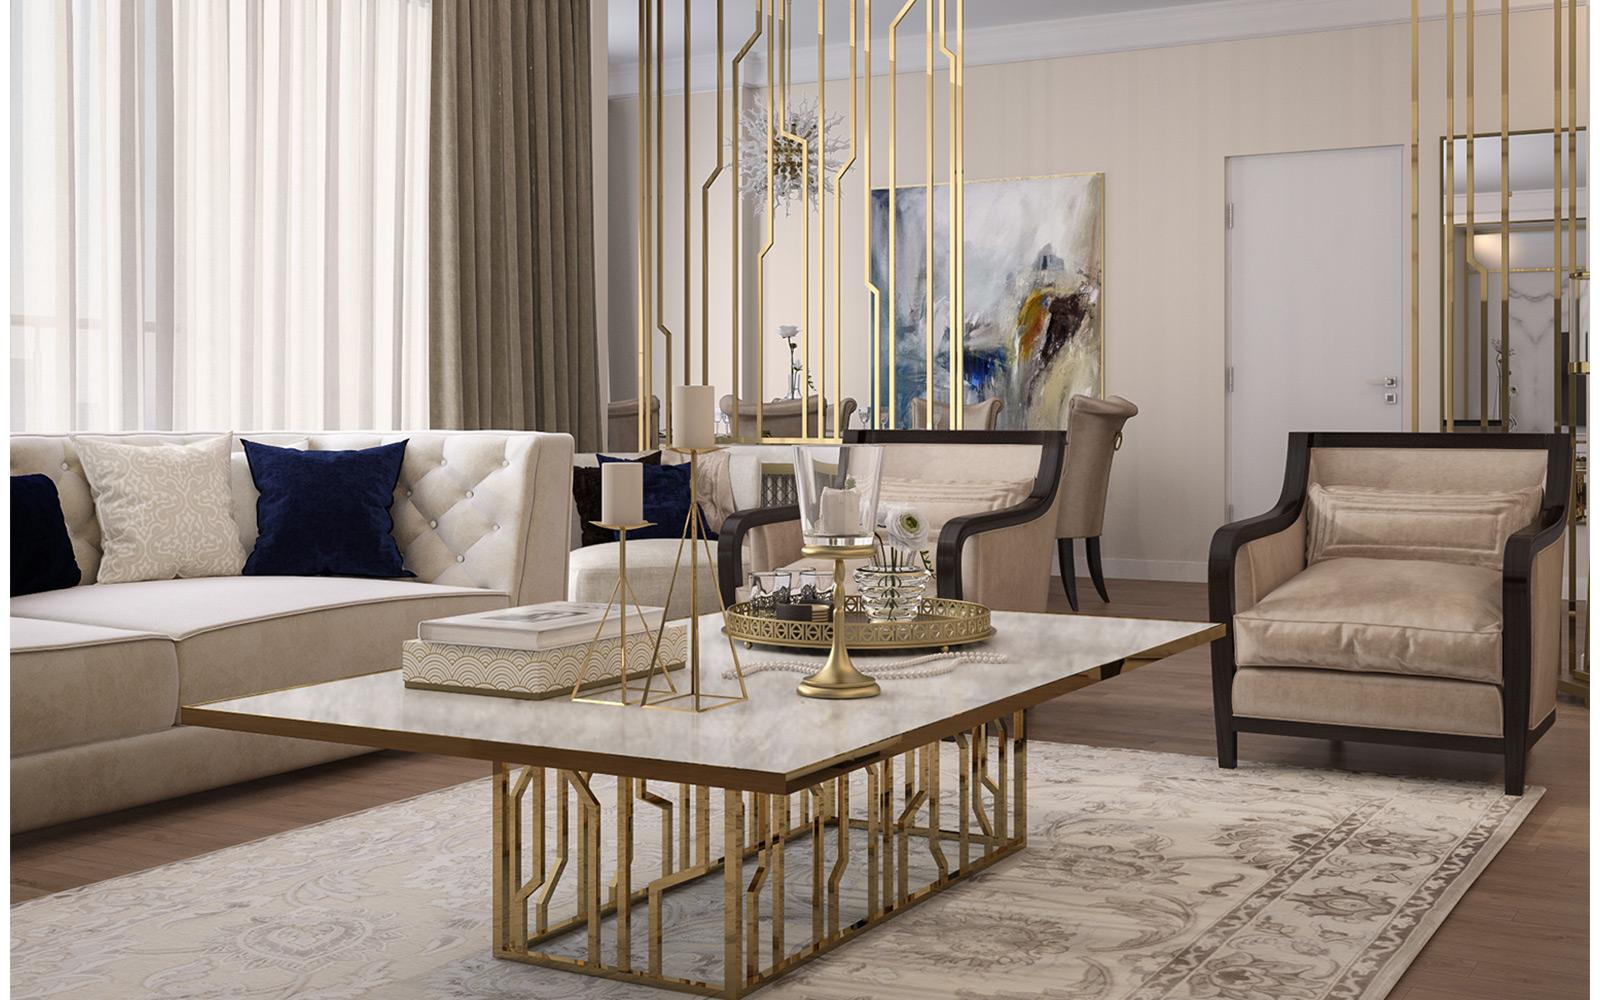 Vogue Design - Istanbul Yeni Moda Flat4